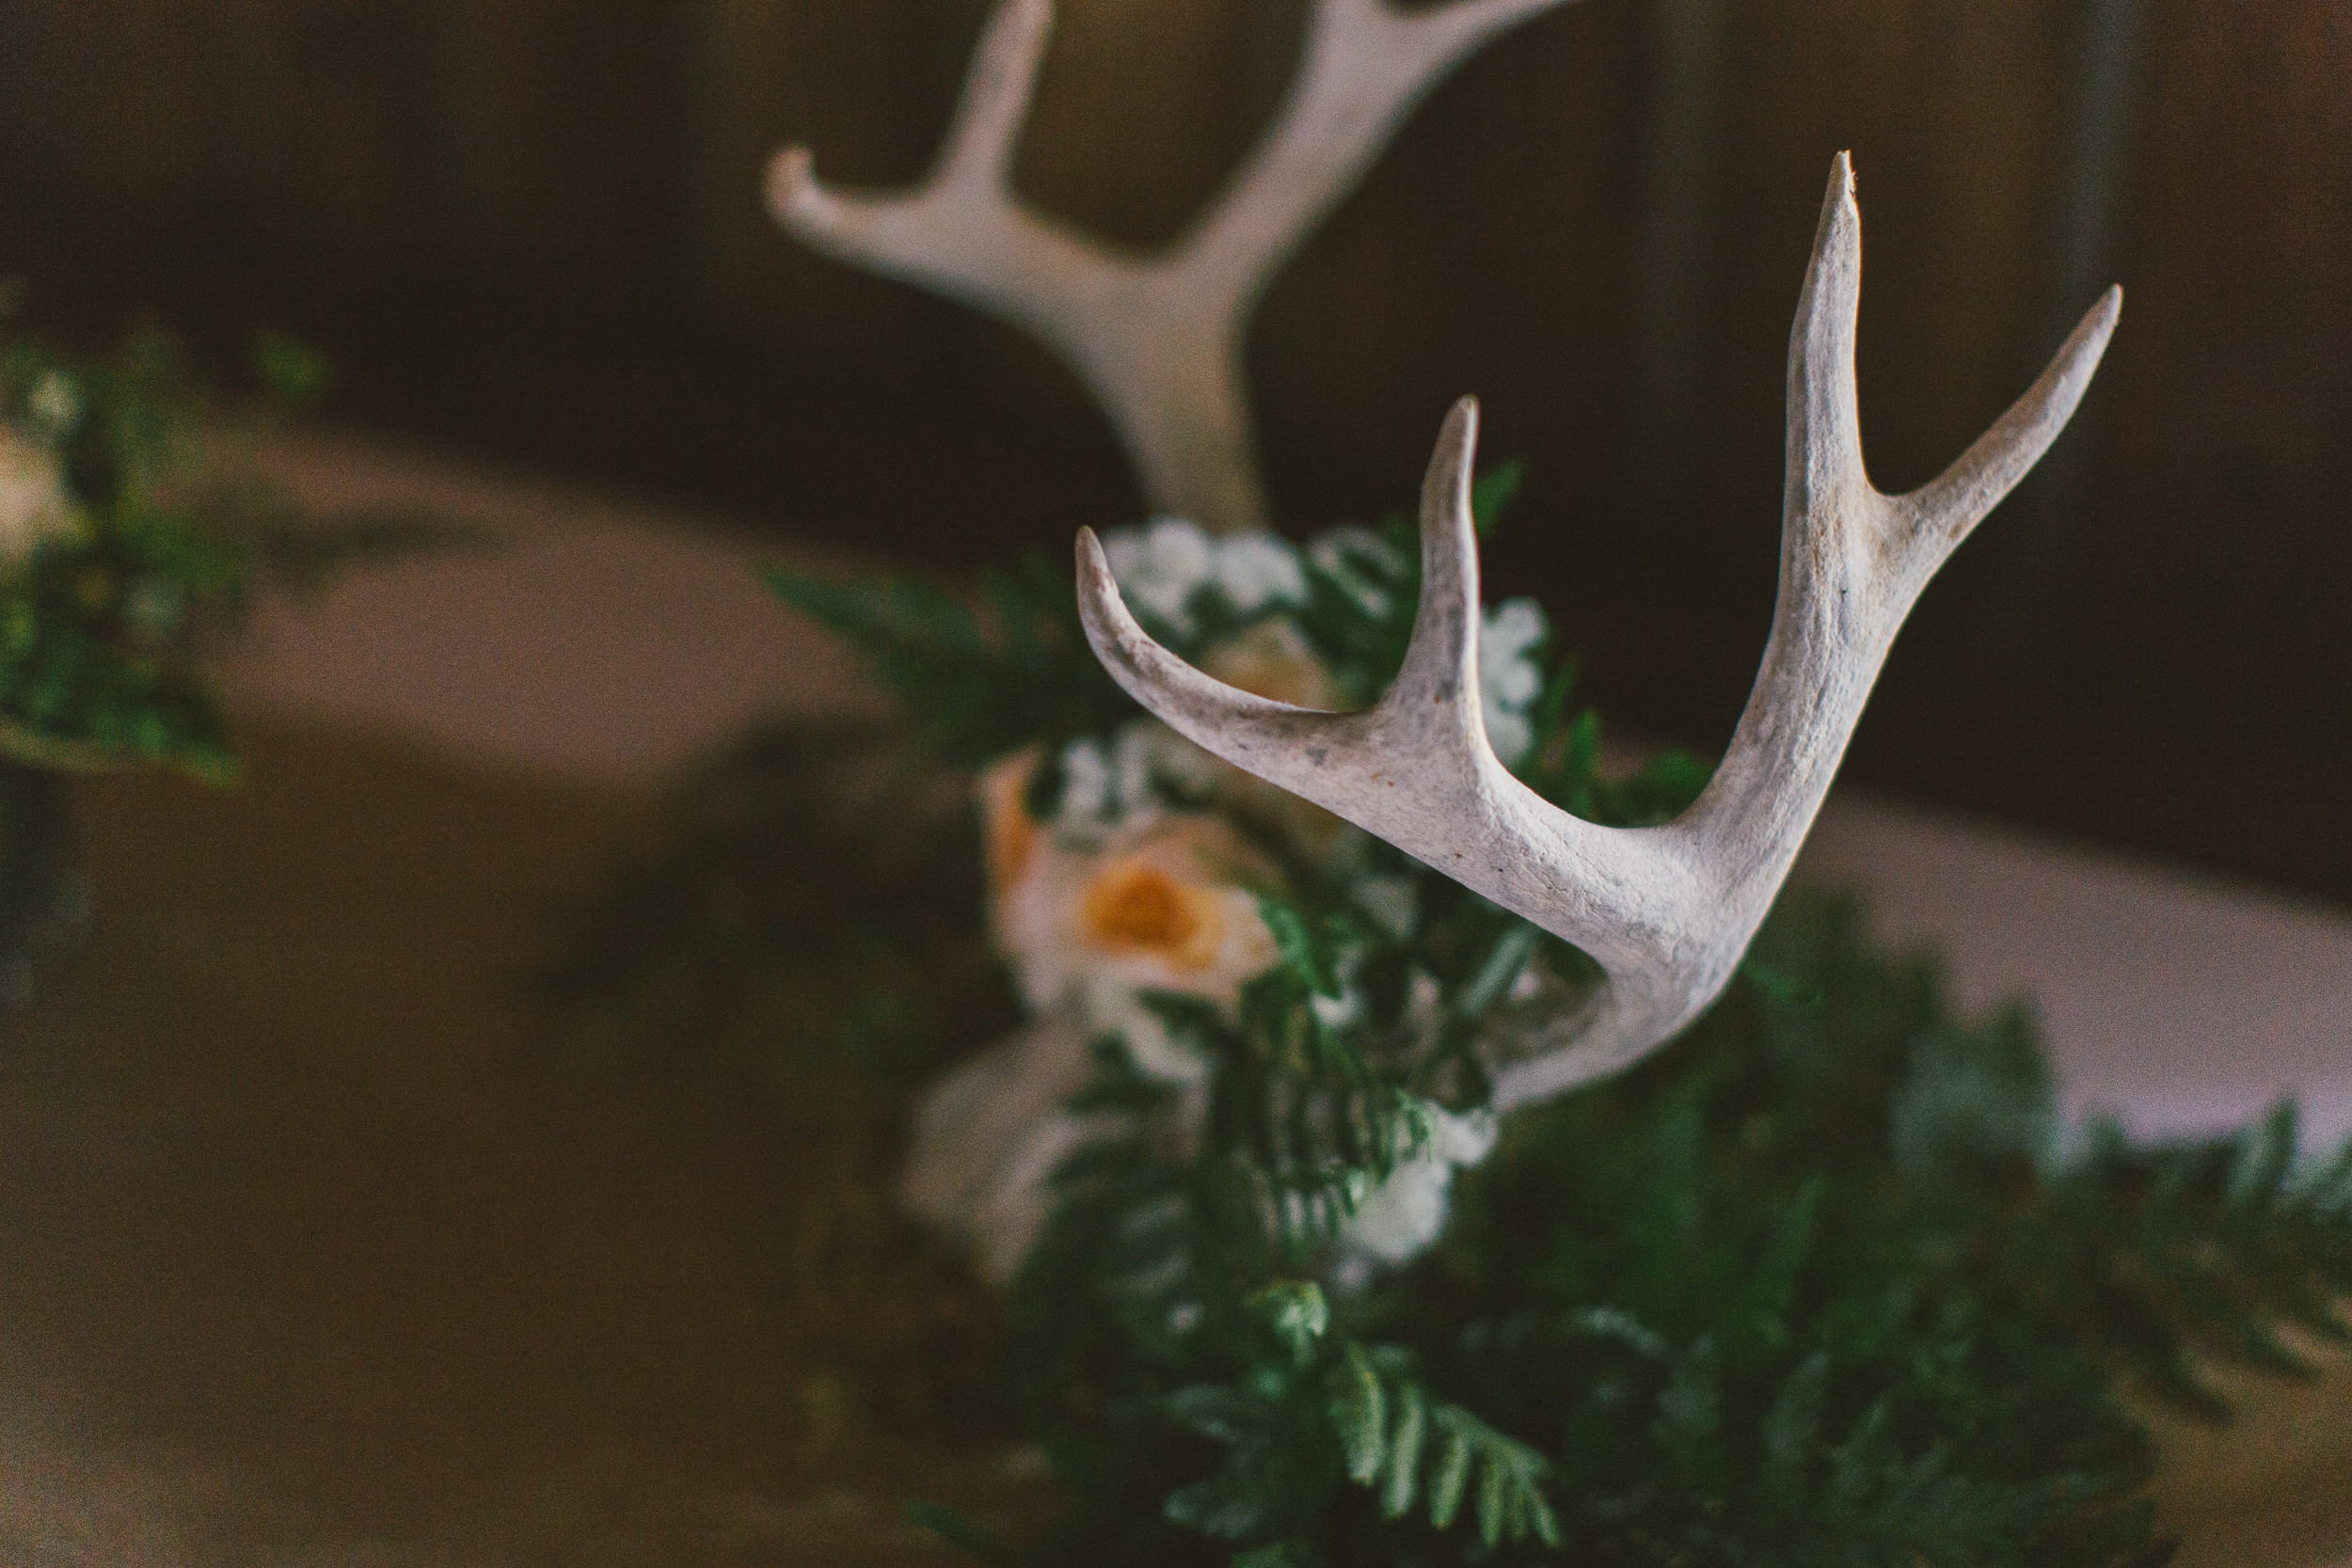 national park themed wedding details